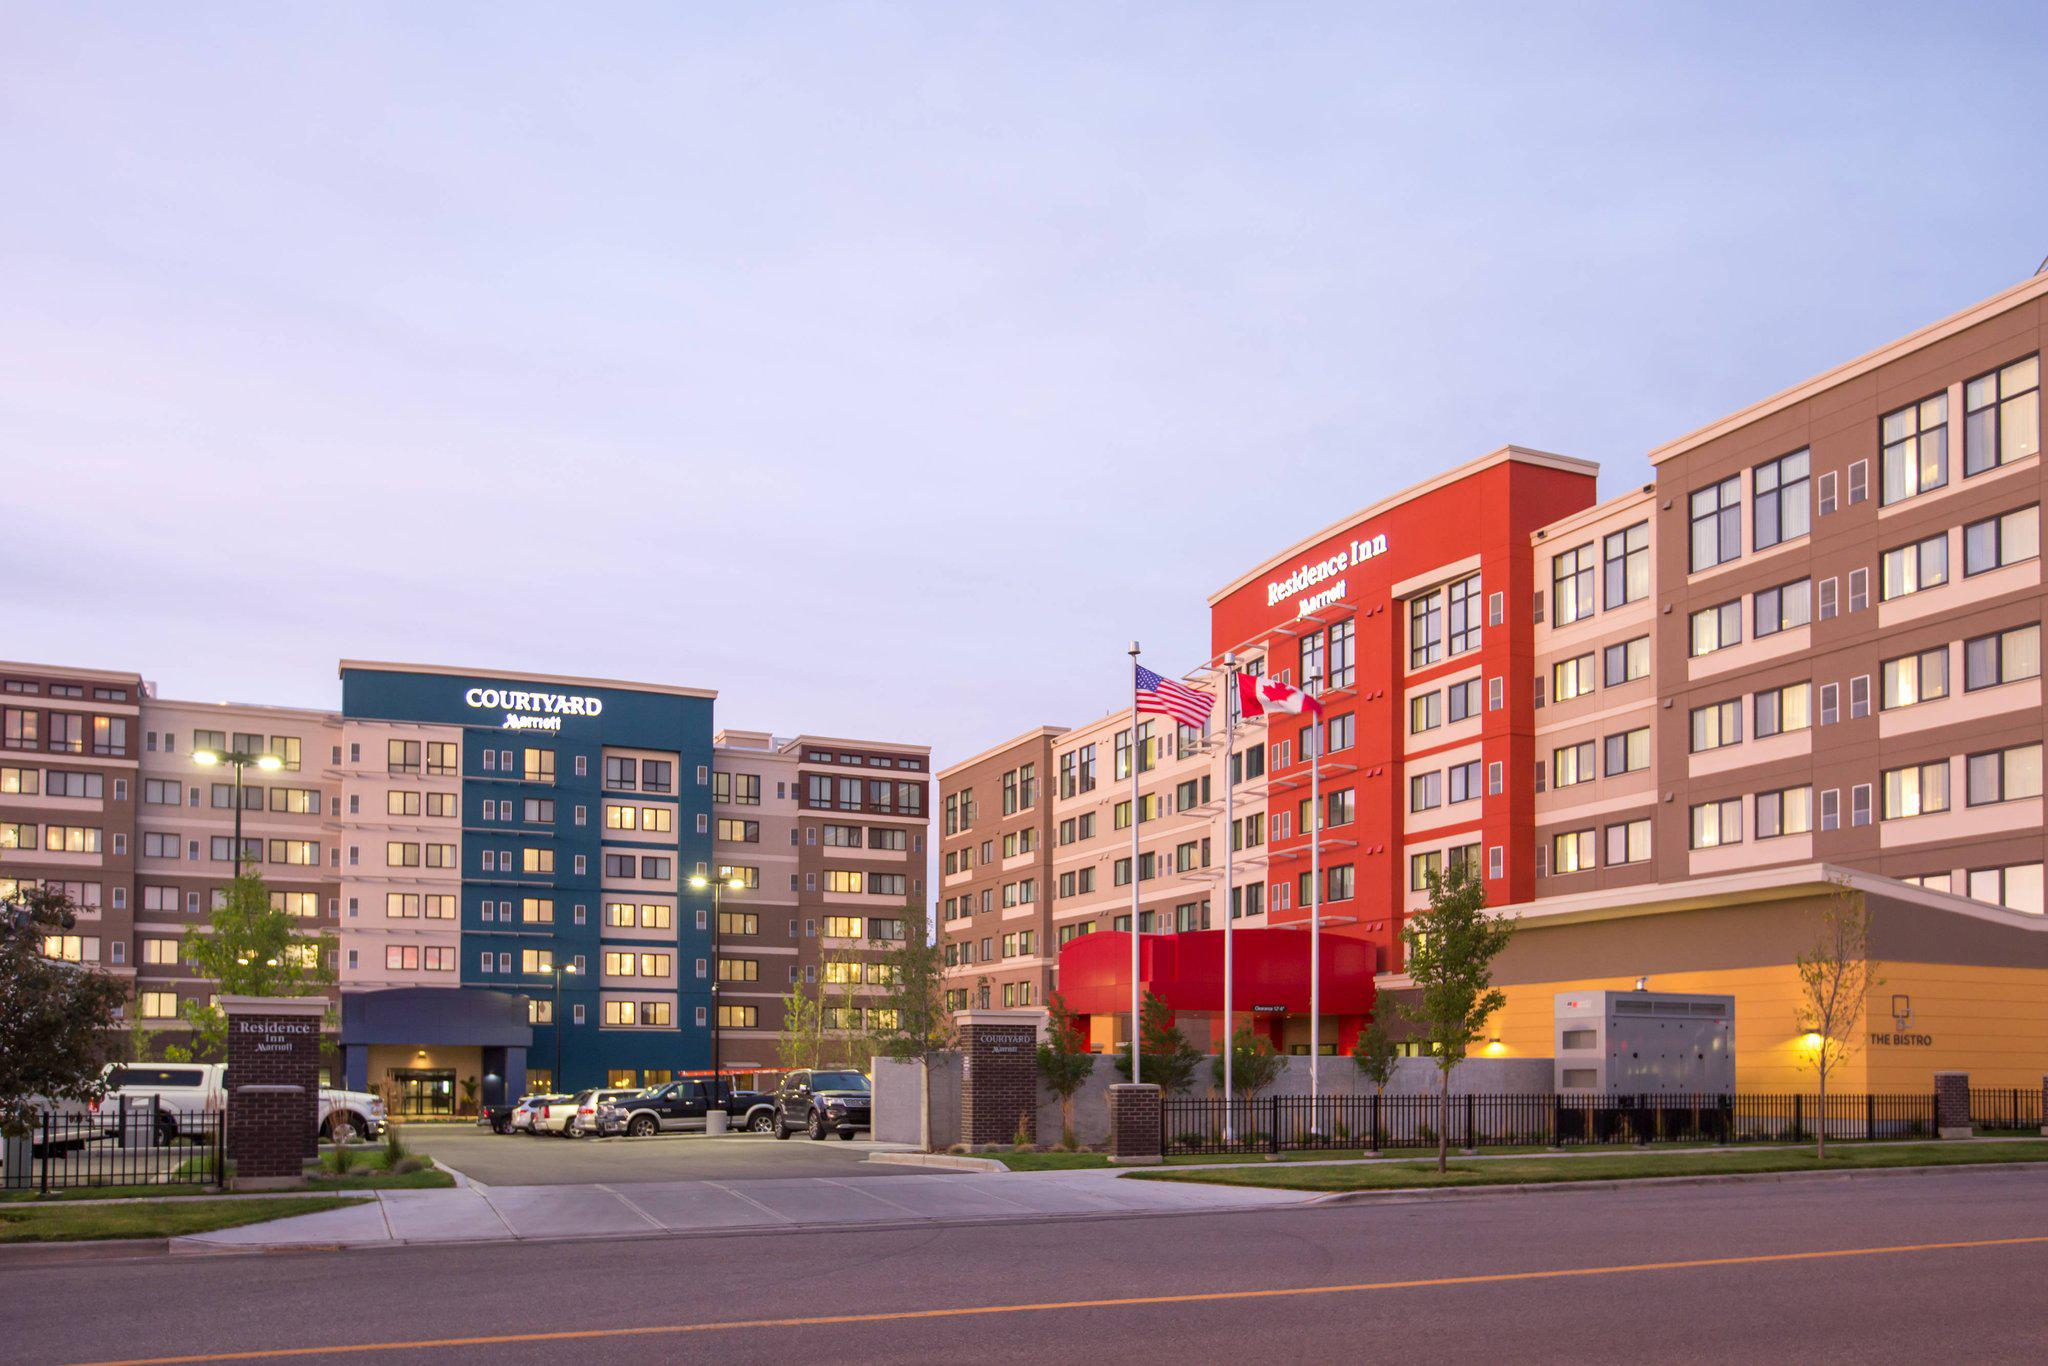 Courtyard by Marriott Calgary South